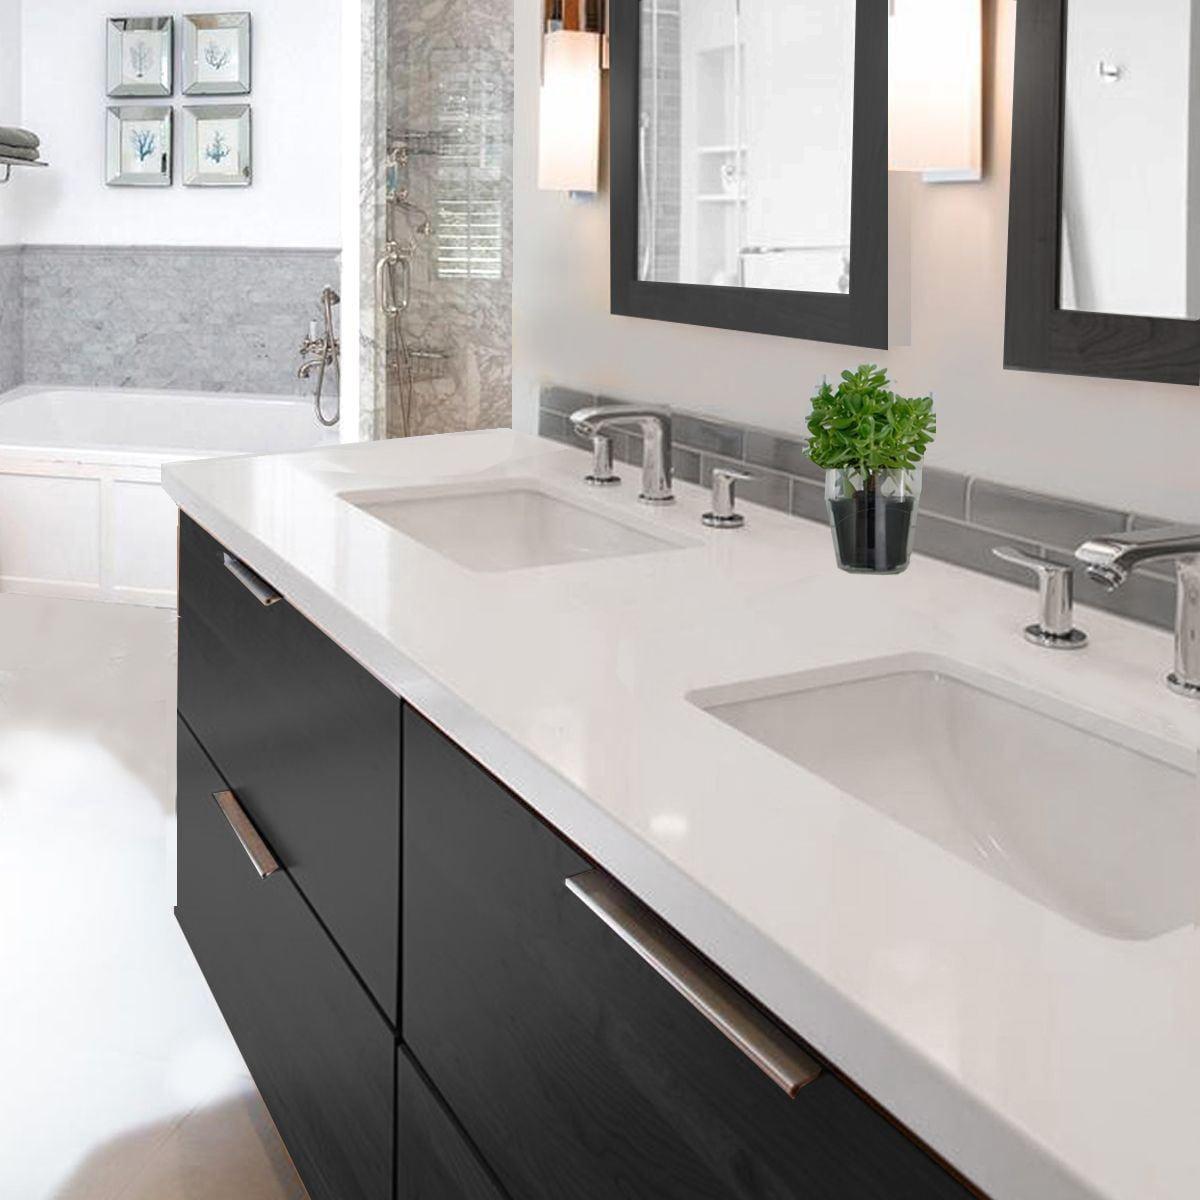 001 Small 16x11 5 Mexican Bathroom Sink Ceramic Drop In Undermount Basin Sinks Home Plumbing Fixtures